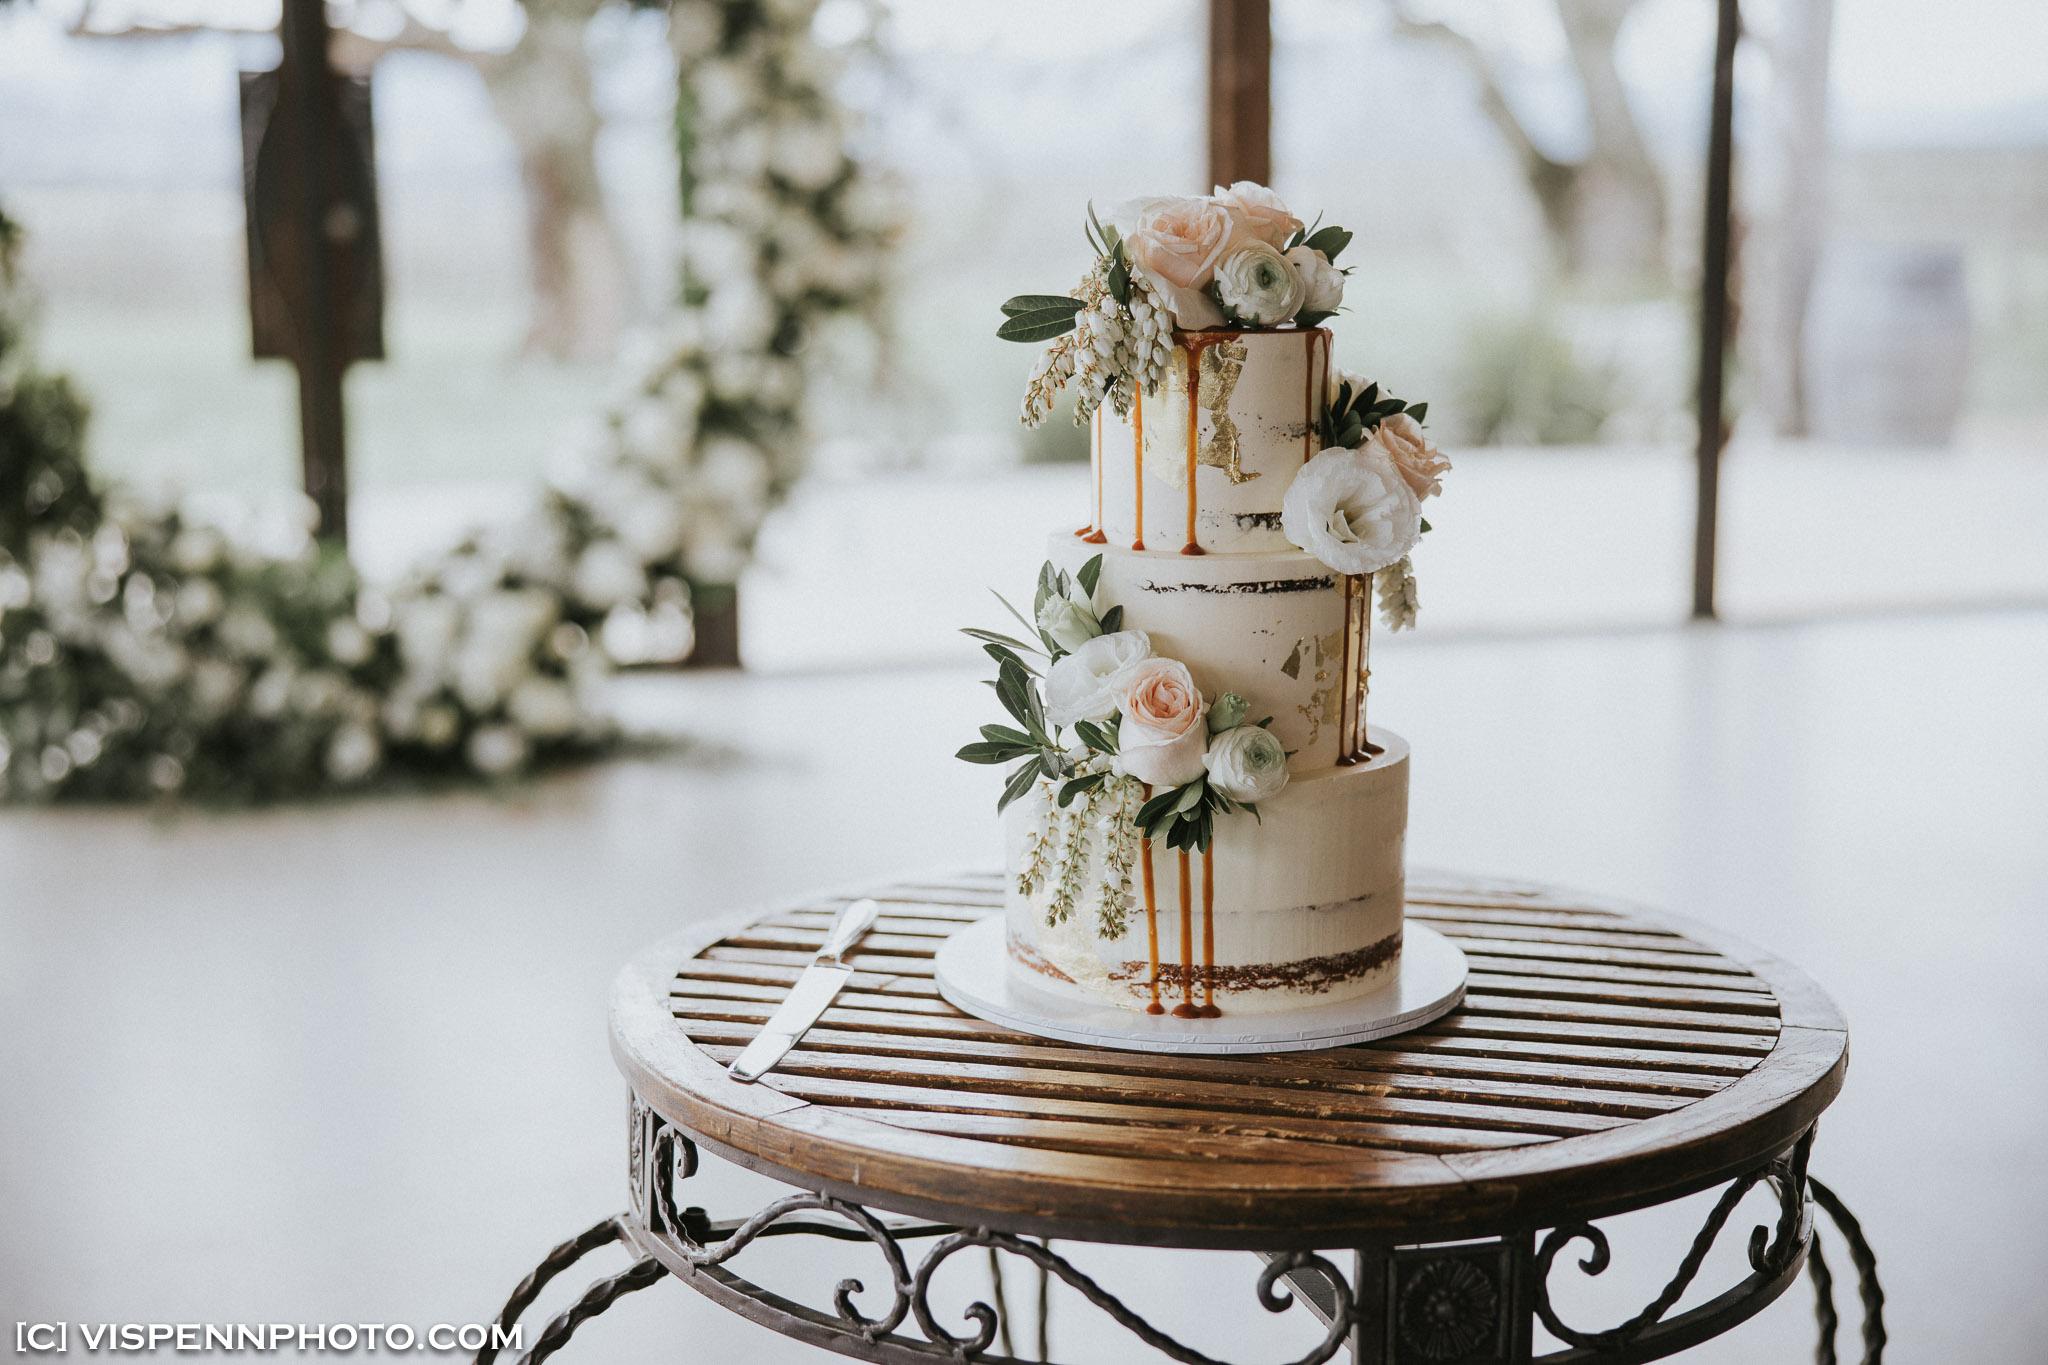 WEDDING DAY Photography Melbourne VISPENN 墨尔本 婚礼跟拍 婚礼摄像 婚礼摄影 结婚照 登记照 LeanneWesley 07758 1P EOSR VISPENN